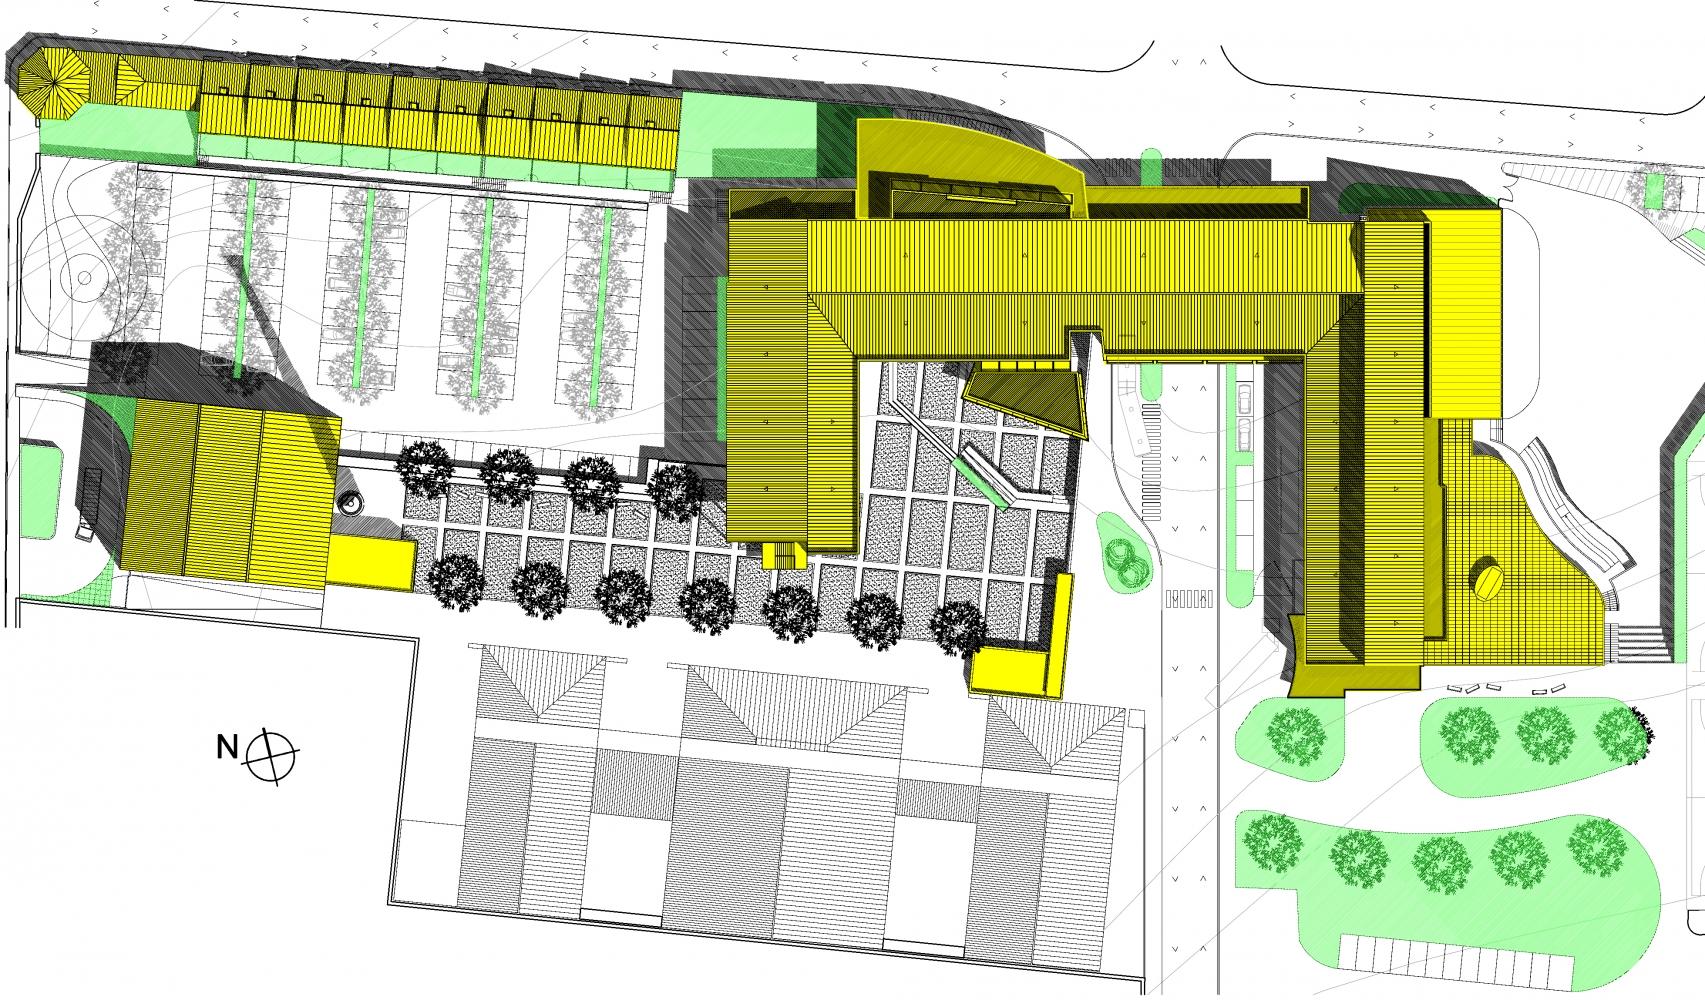 09-epernay-img-002 Pascale SEURIN Architecte - Pascale SEURIN Architecte